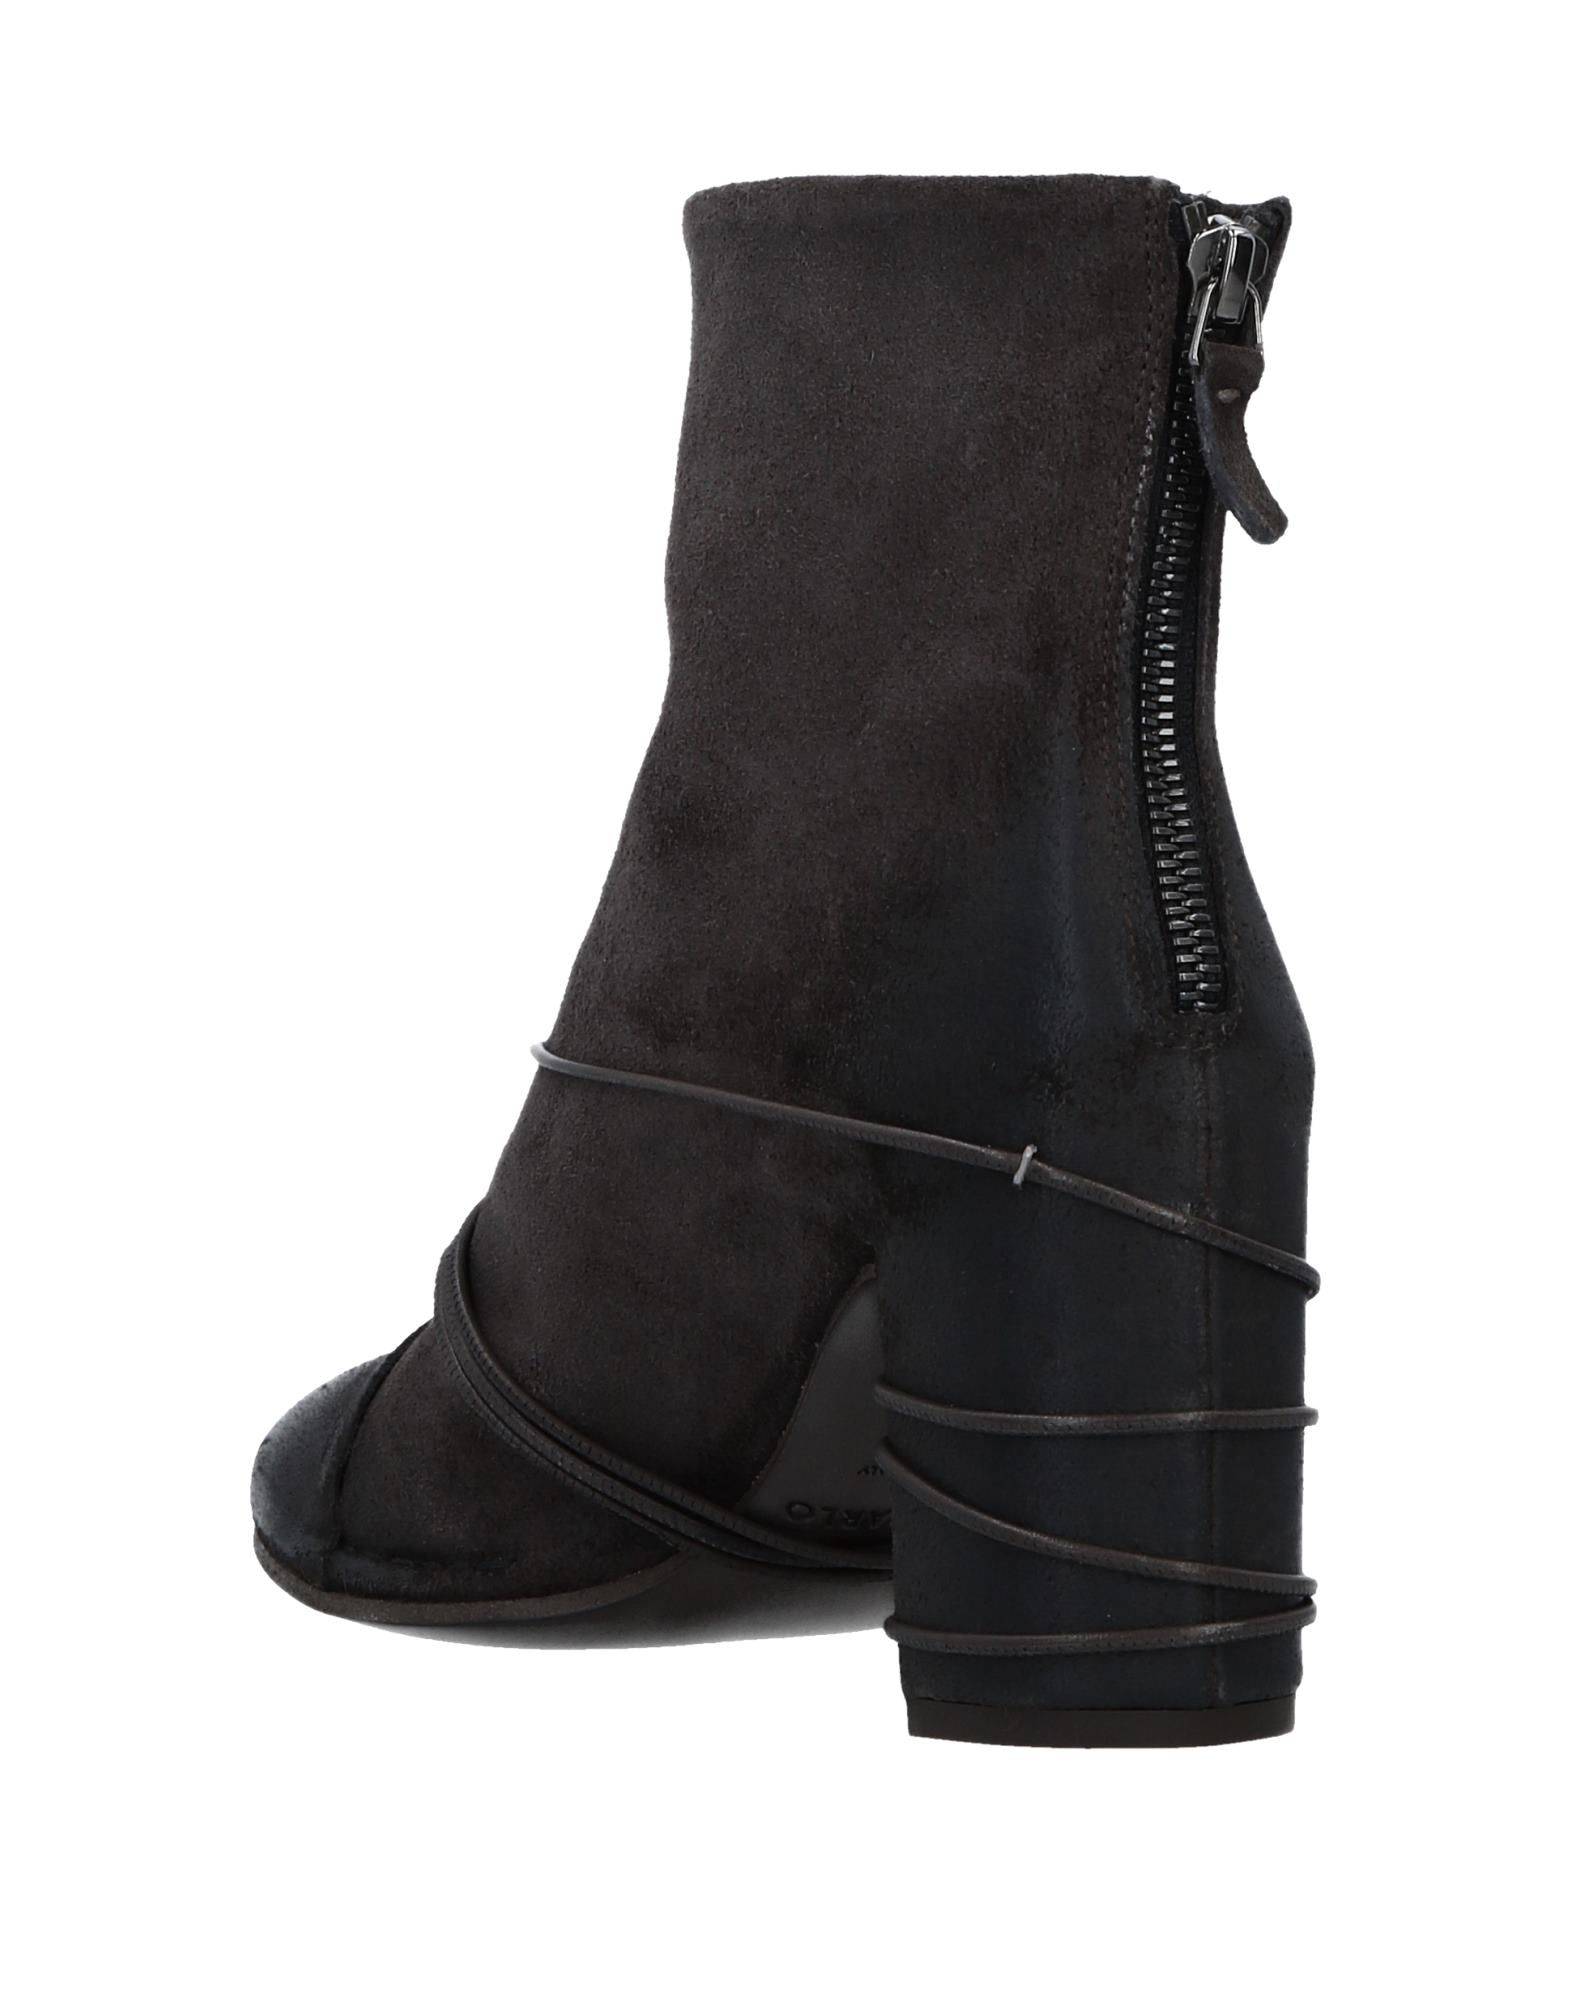 Rabatt Schuhe Del Carlo Stiefelette 11528248FD Damen  11528248FD Stiefelette 46b1a9